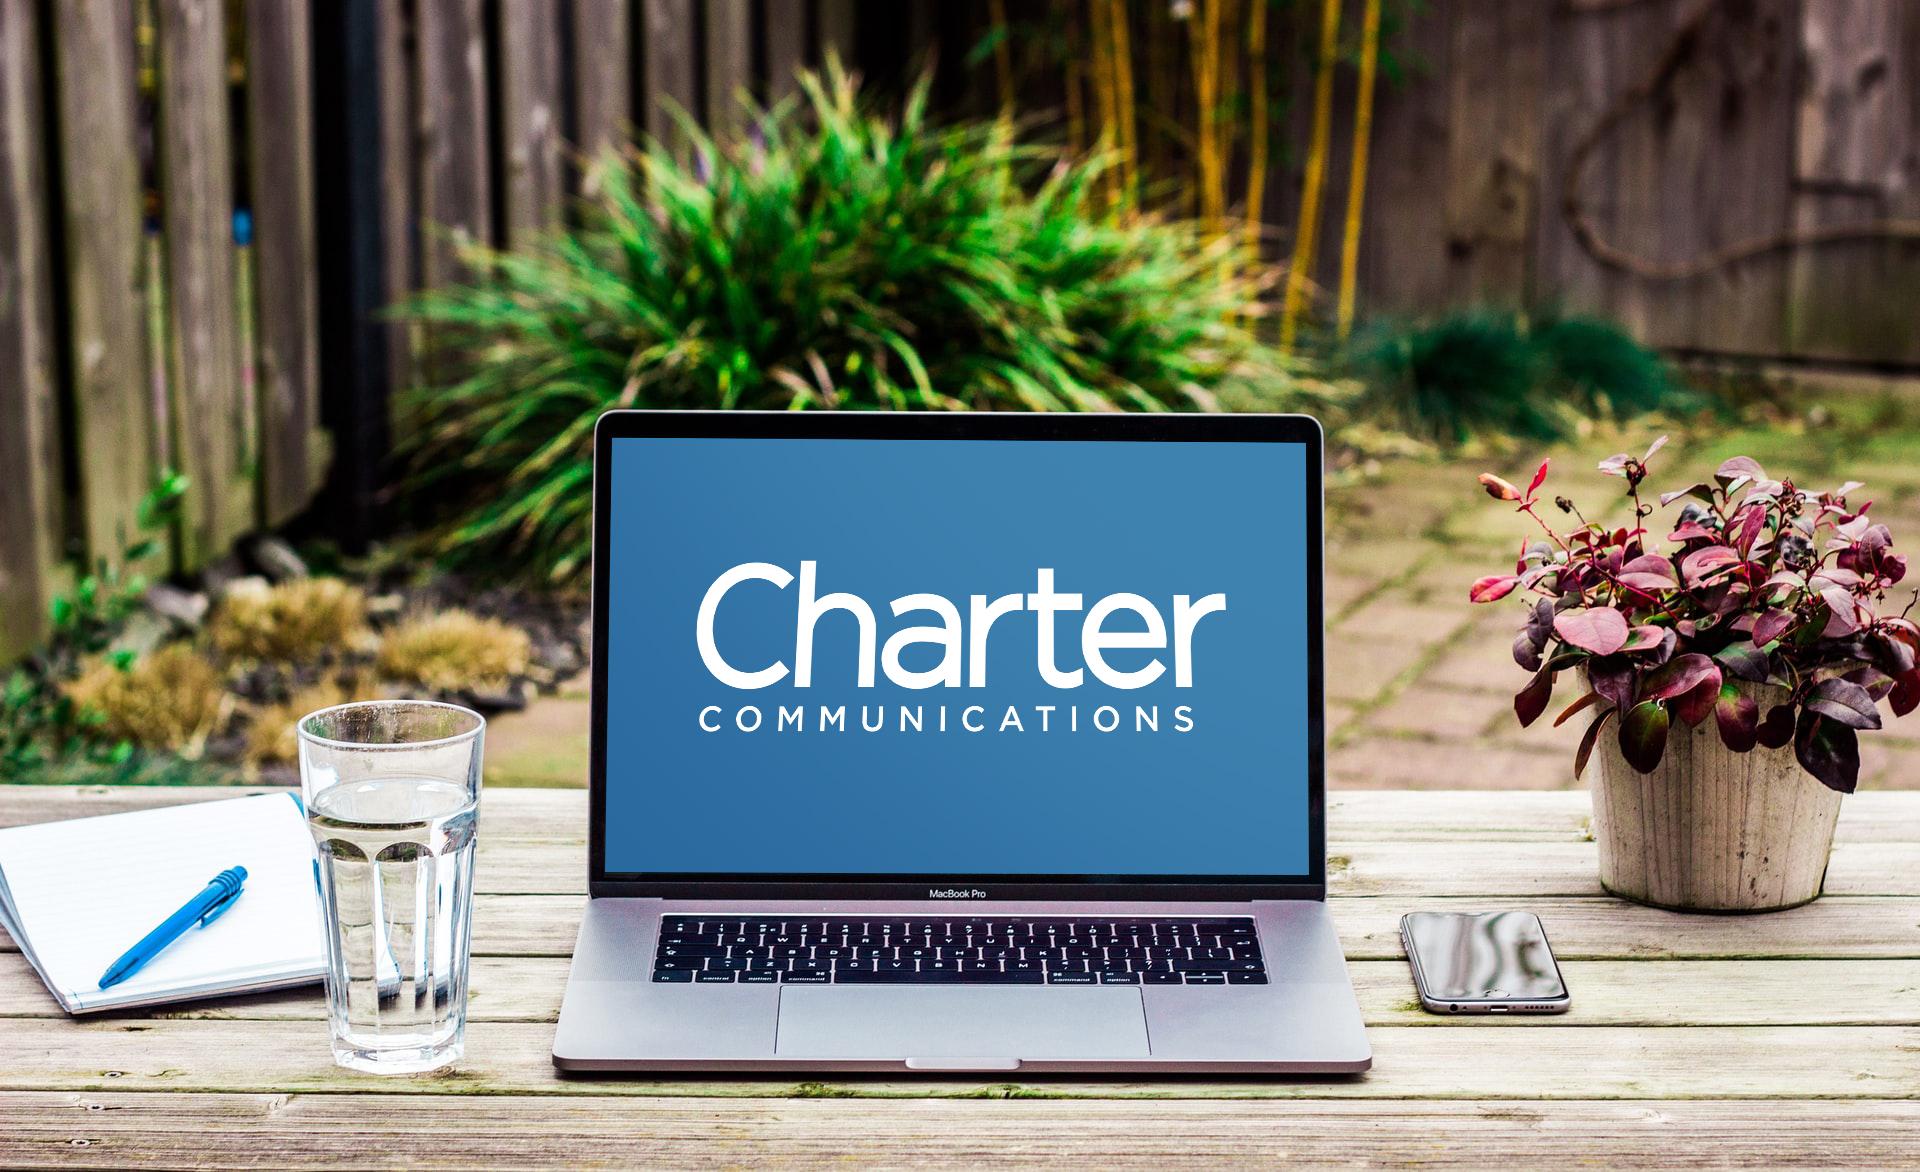 charter communications bill pay